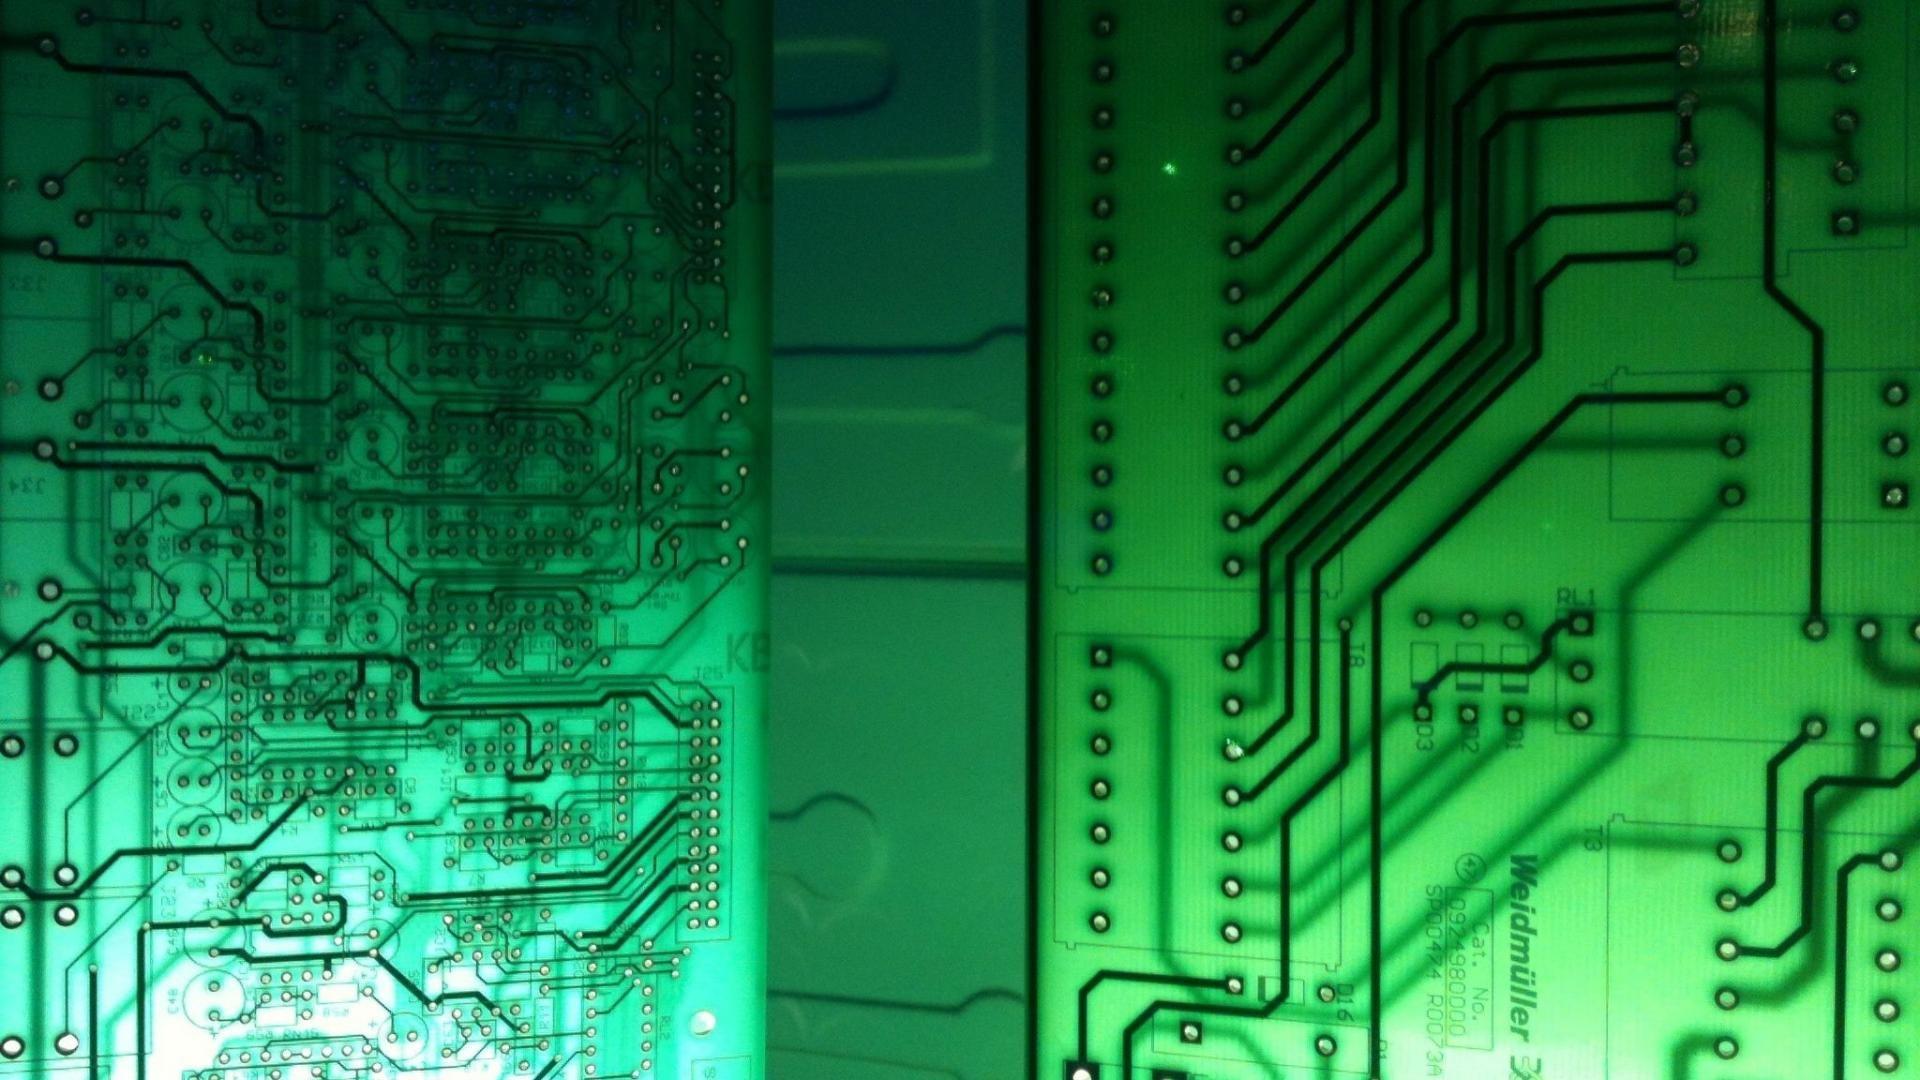 Circuit Board Wallpapers Hd Df Pinterest Circuits Wallpaper